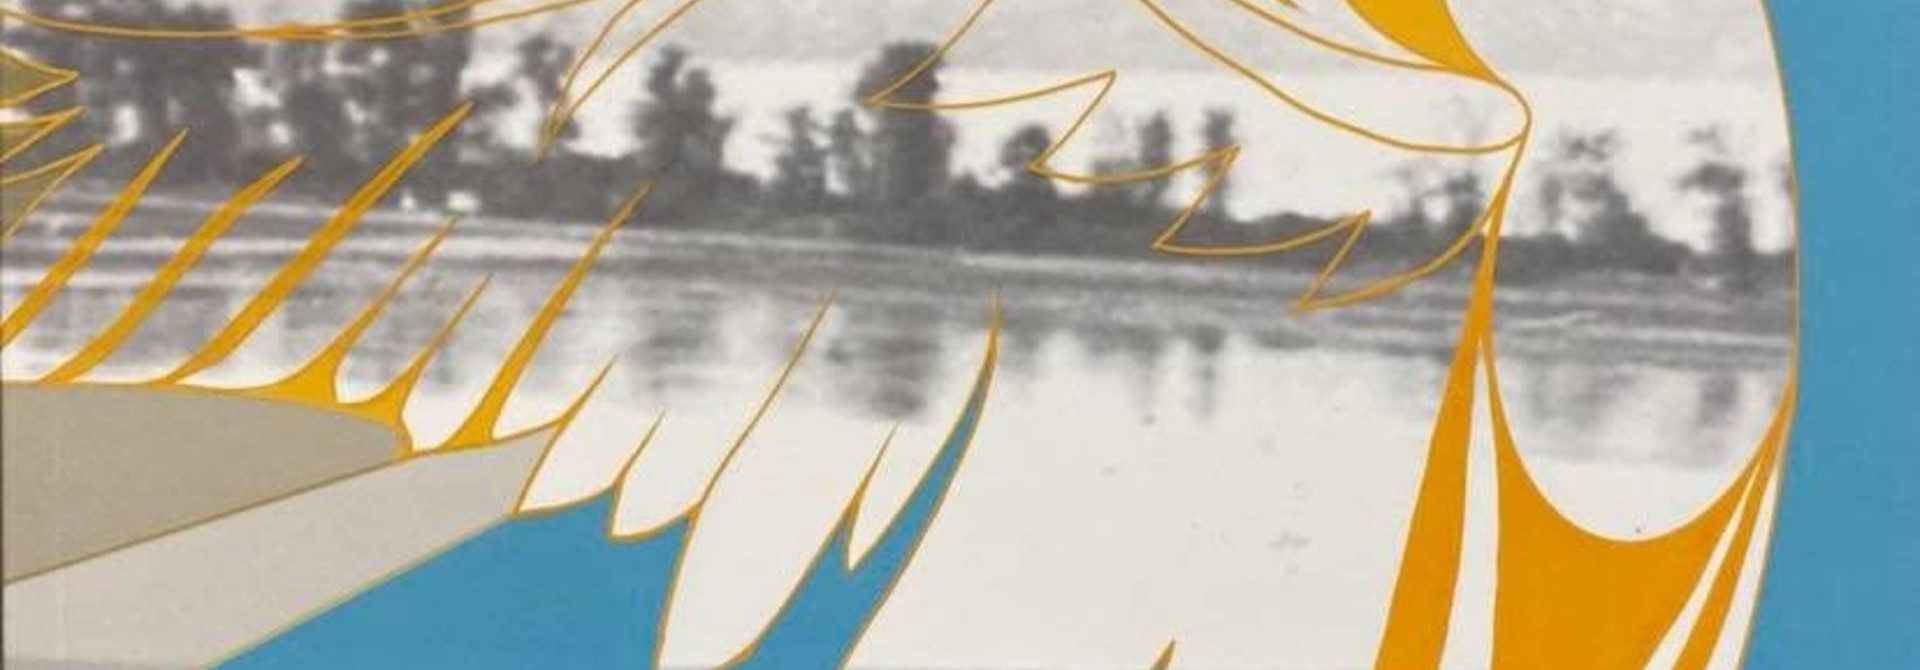 Book - Semá:th X̱ó:tsa: Sts'ólemeqwelh Sx̱ó:tsa / Great Gramma's Lake